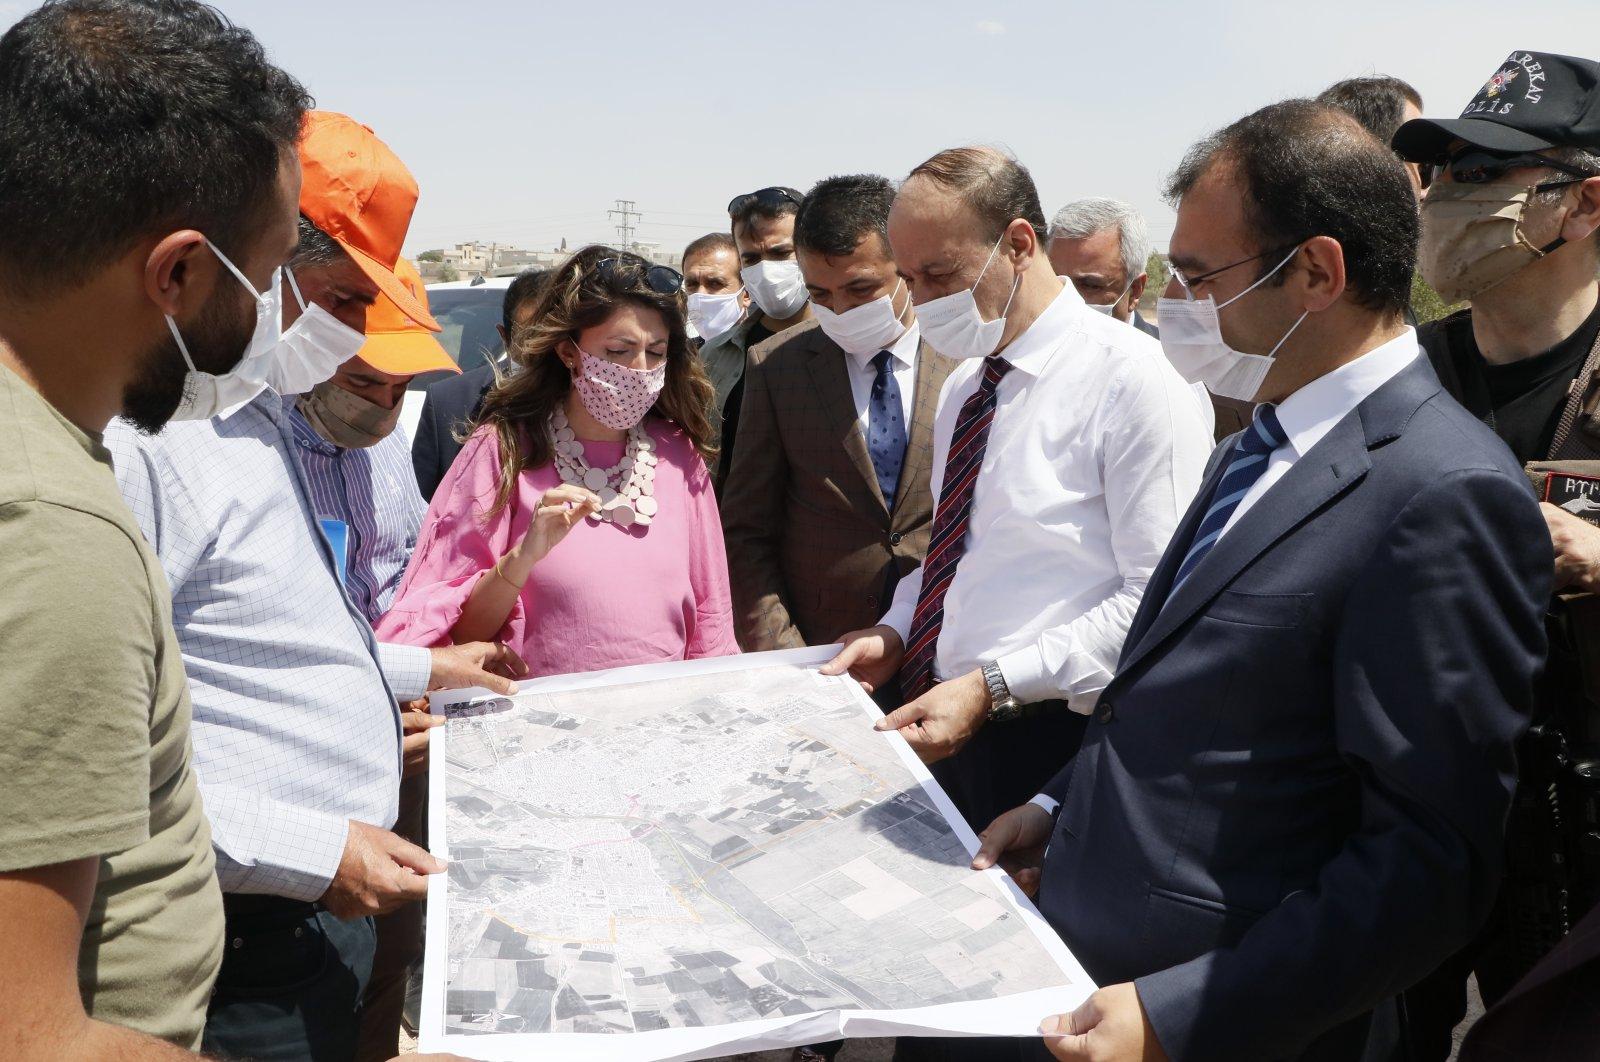 Şanlıurfa Governor Abdullah Erin (second right), inspects the construction site of the customs gate that links Syria's Ras al-Ayn to Turkey's Şanlıurfa, June 19, 2020 (AA Photo)